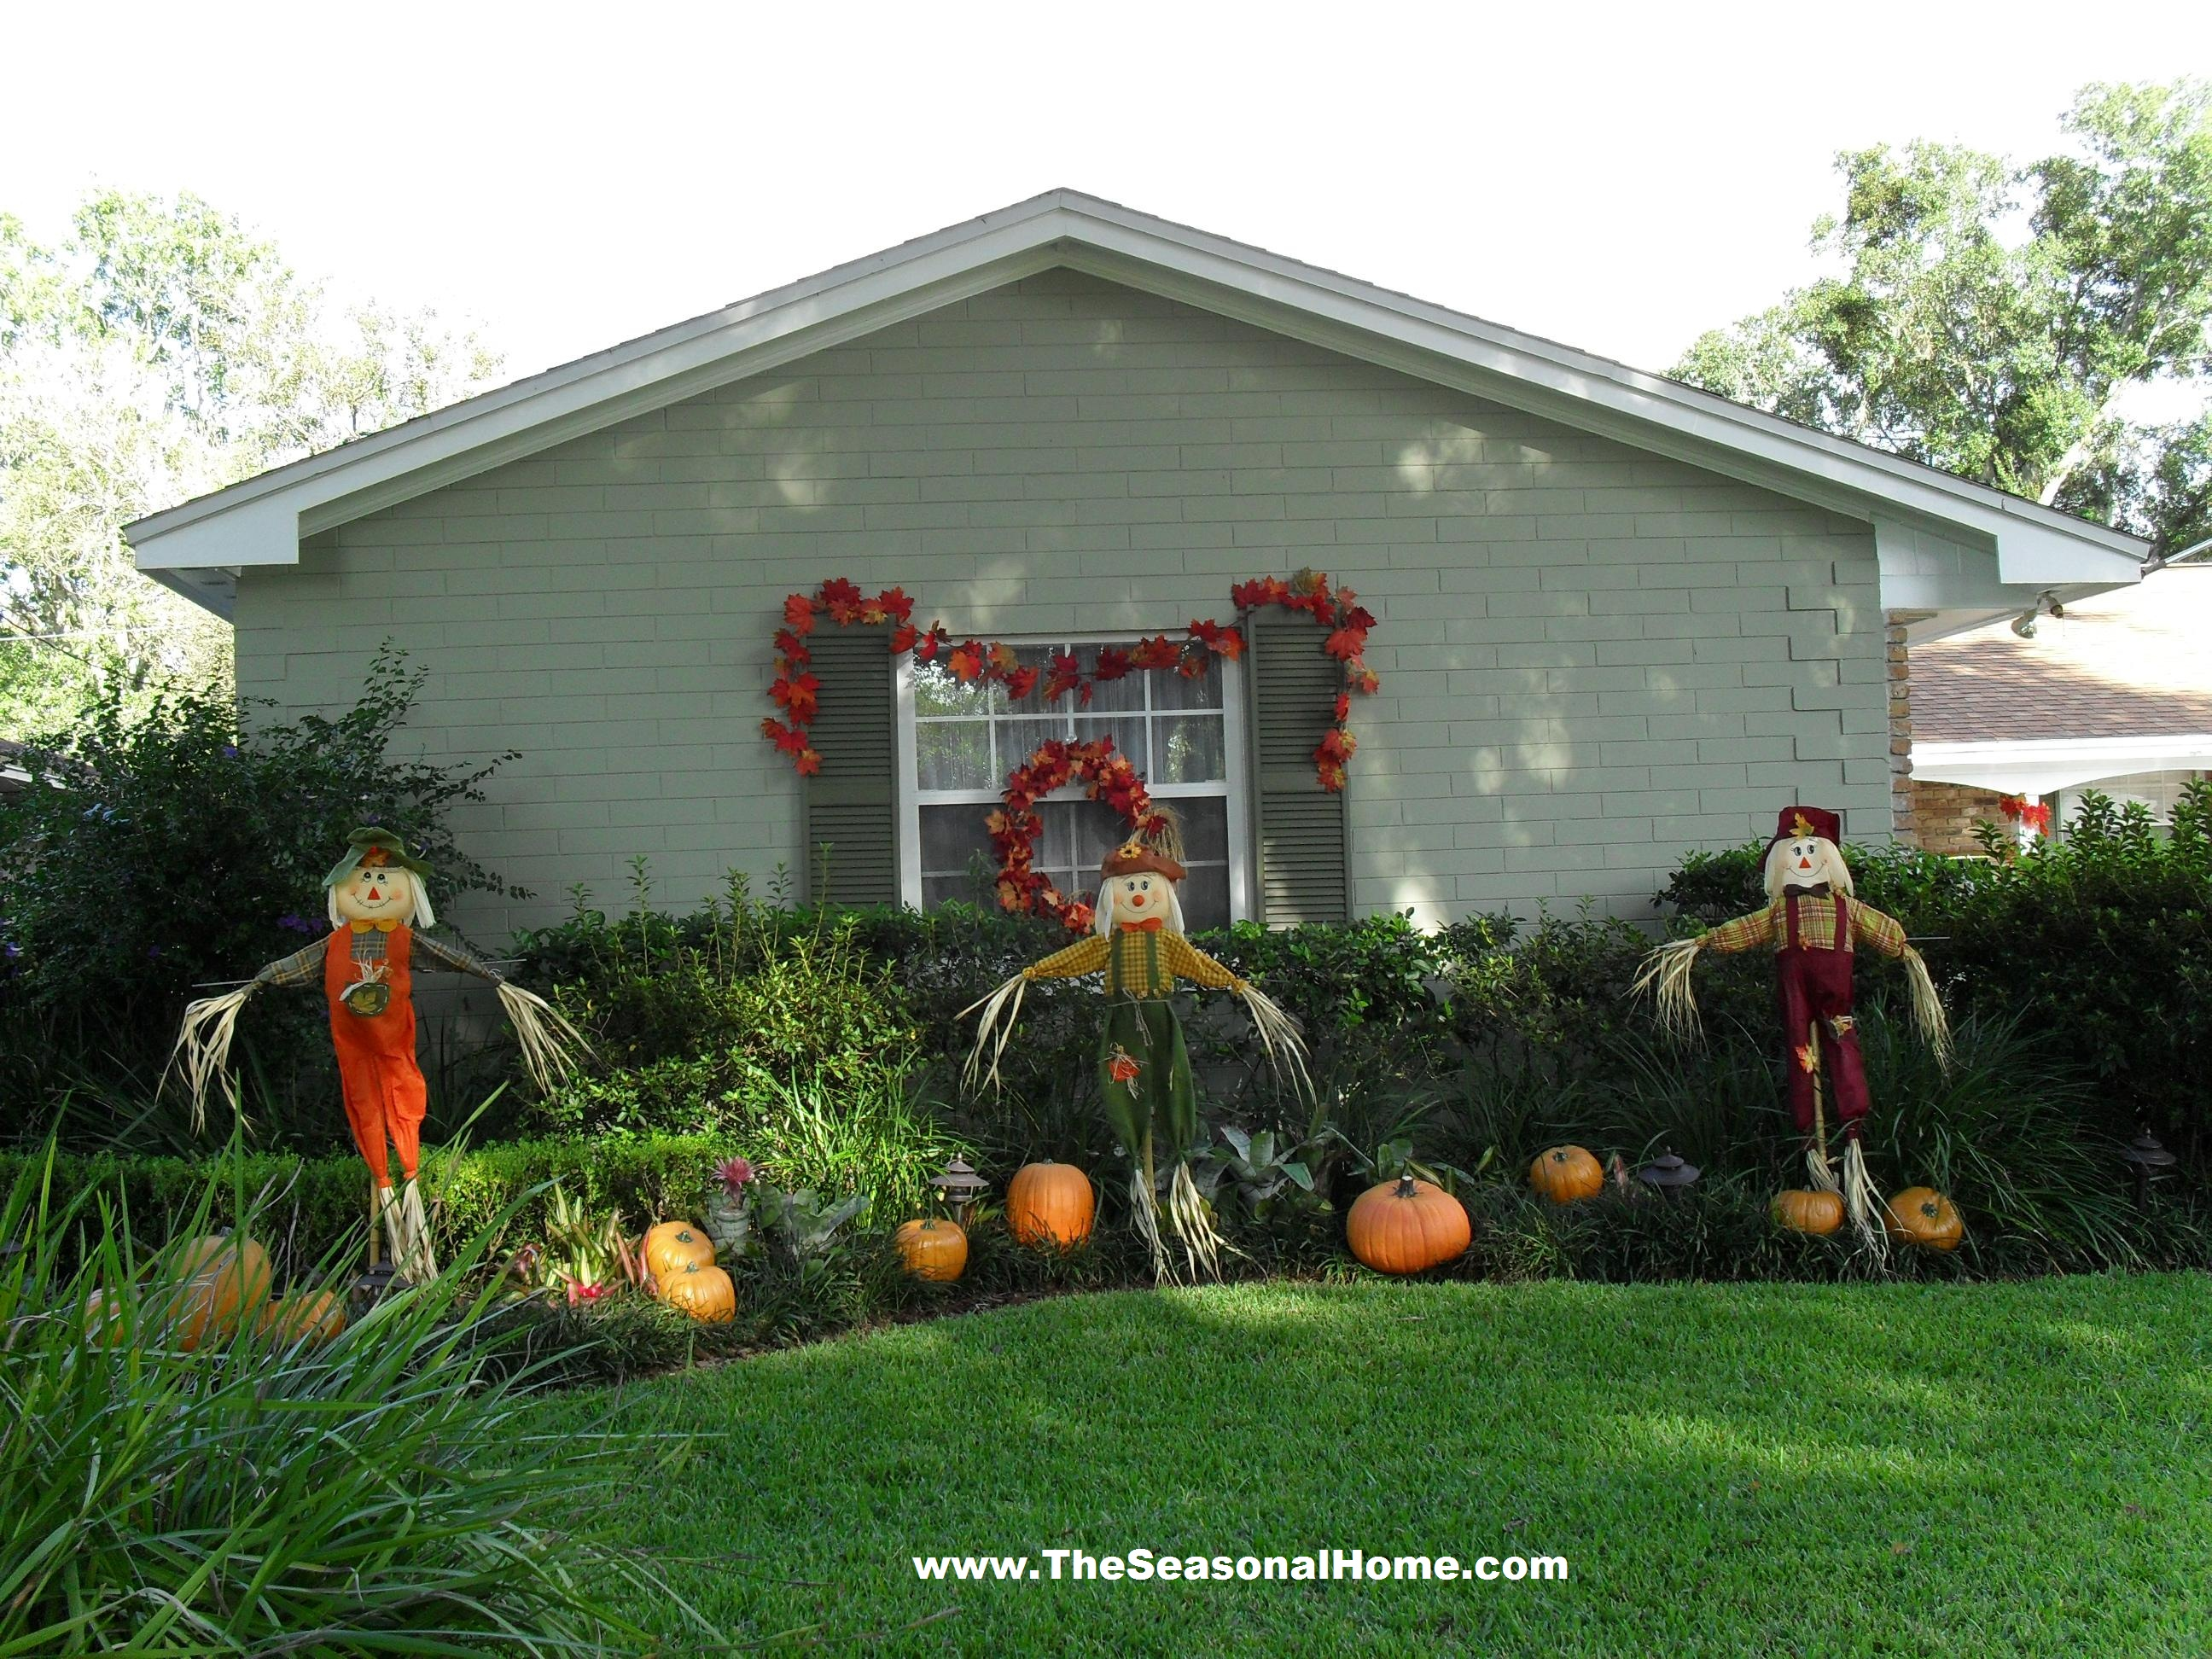 FALL YARD DECORATION IDEAS « The Seasonal Home on Lawn Decorating Ideas id=39041